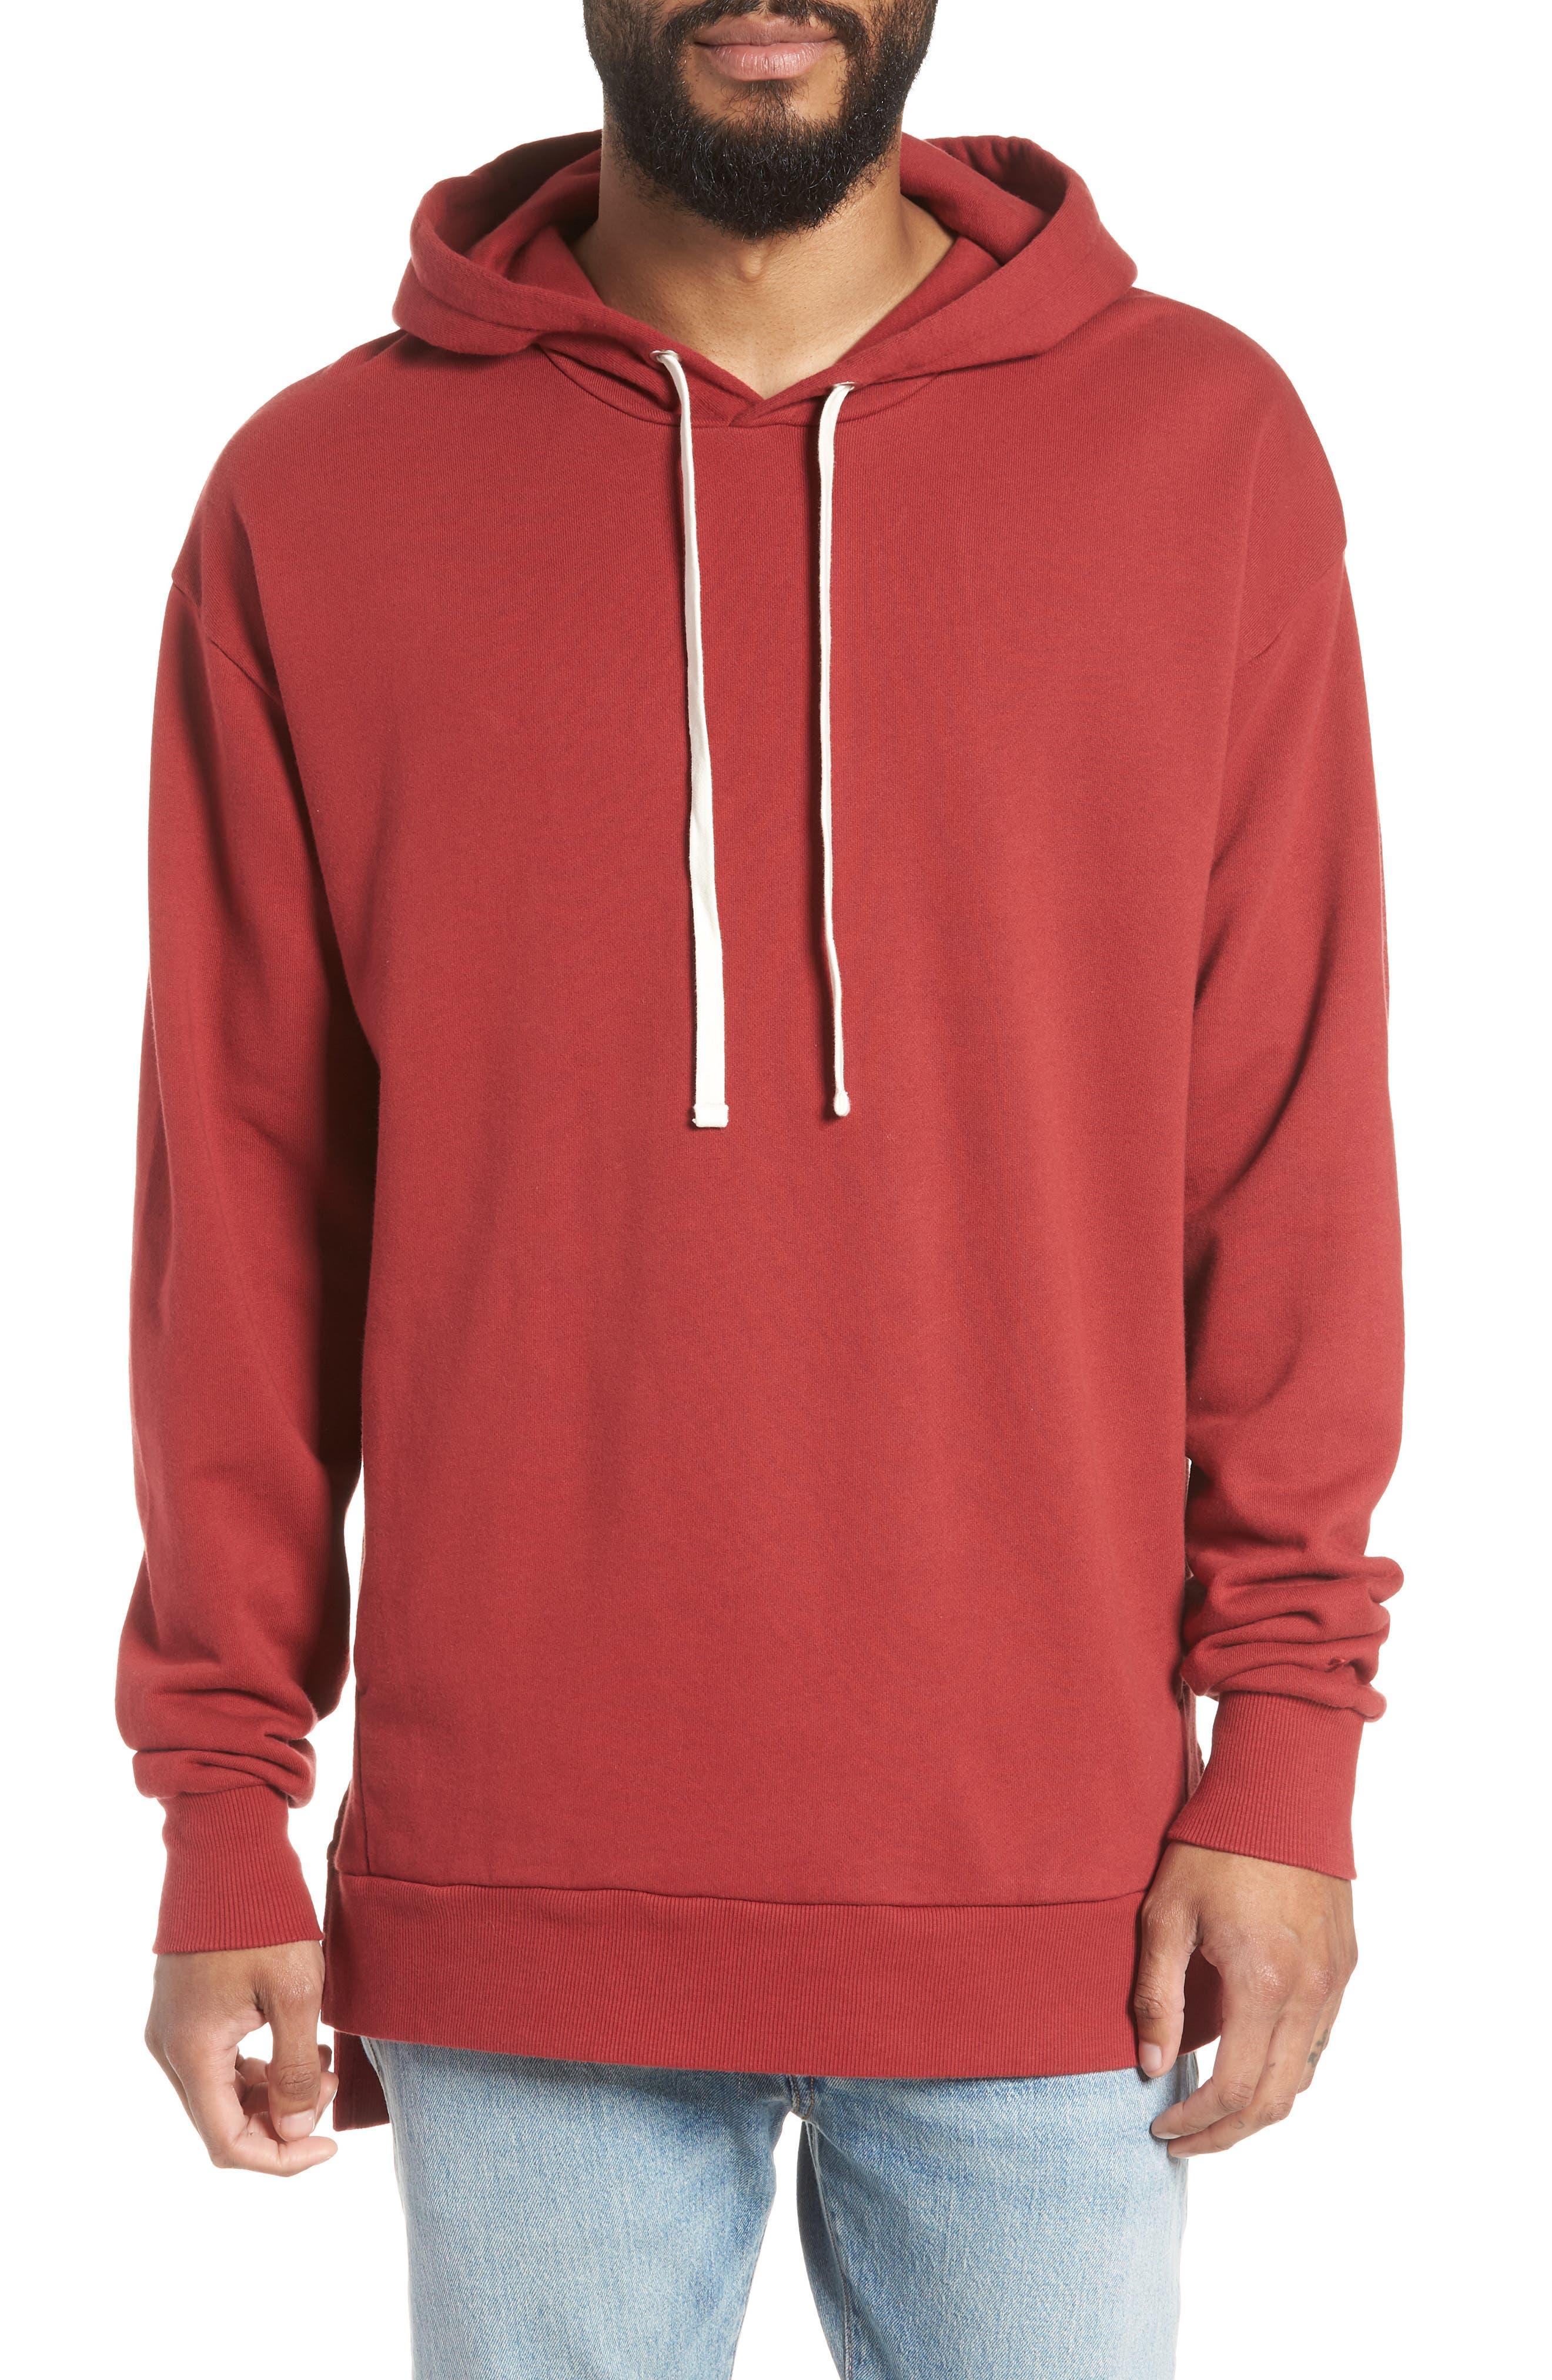 Rugger Hooded Sweatshirt,                         Main,                         color, Dark Cherry